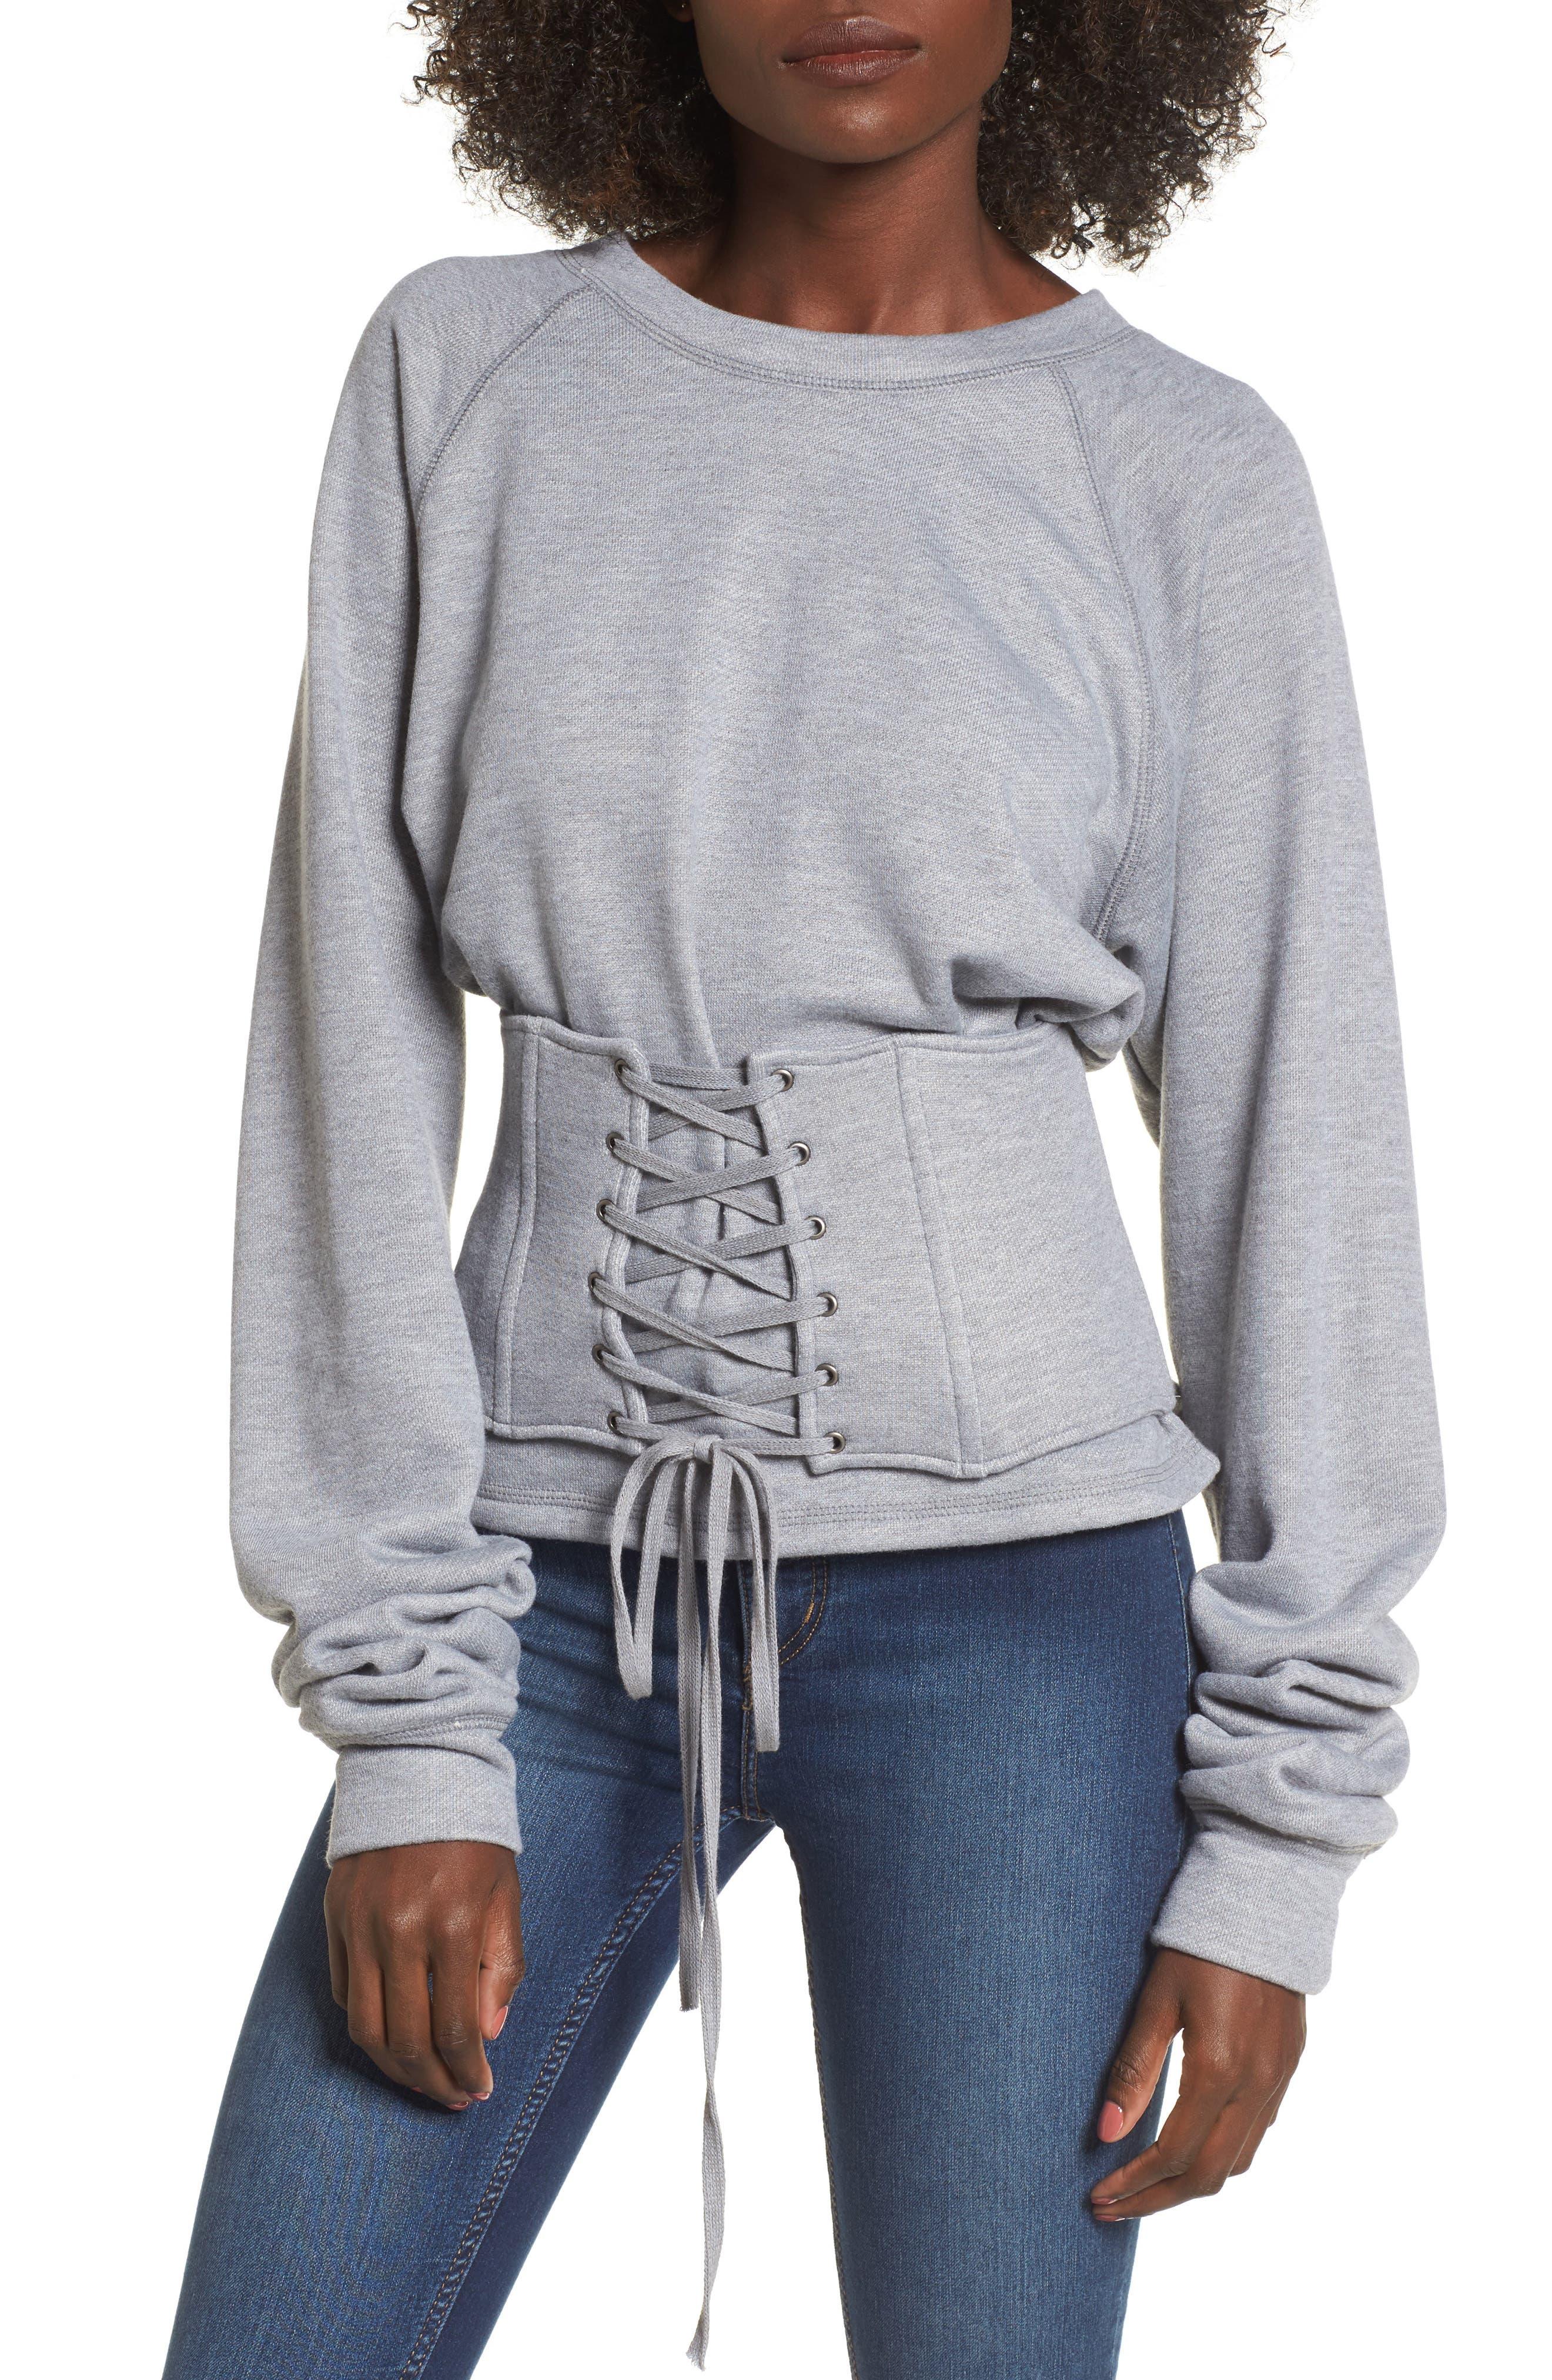 Mason Corset Sweatshirt,                         Main,                         color, Heather Grey